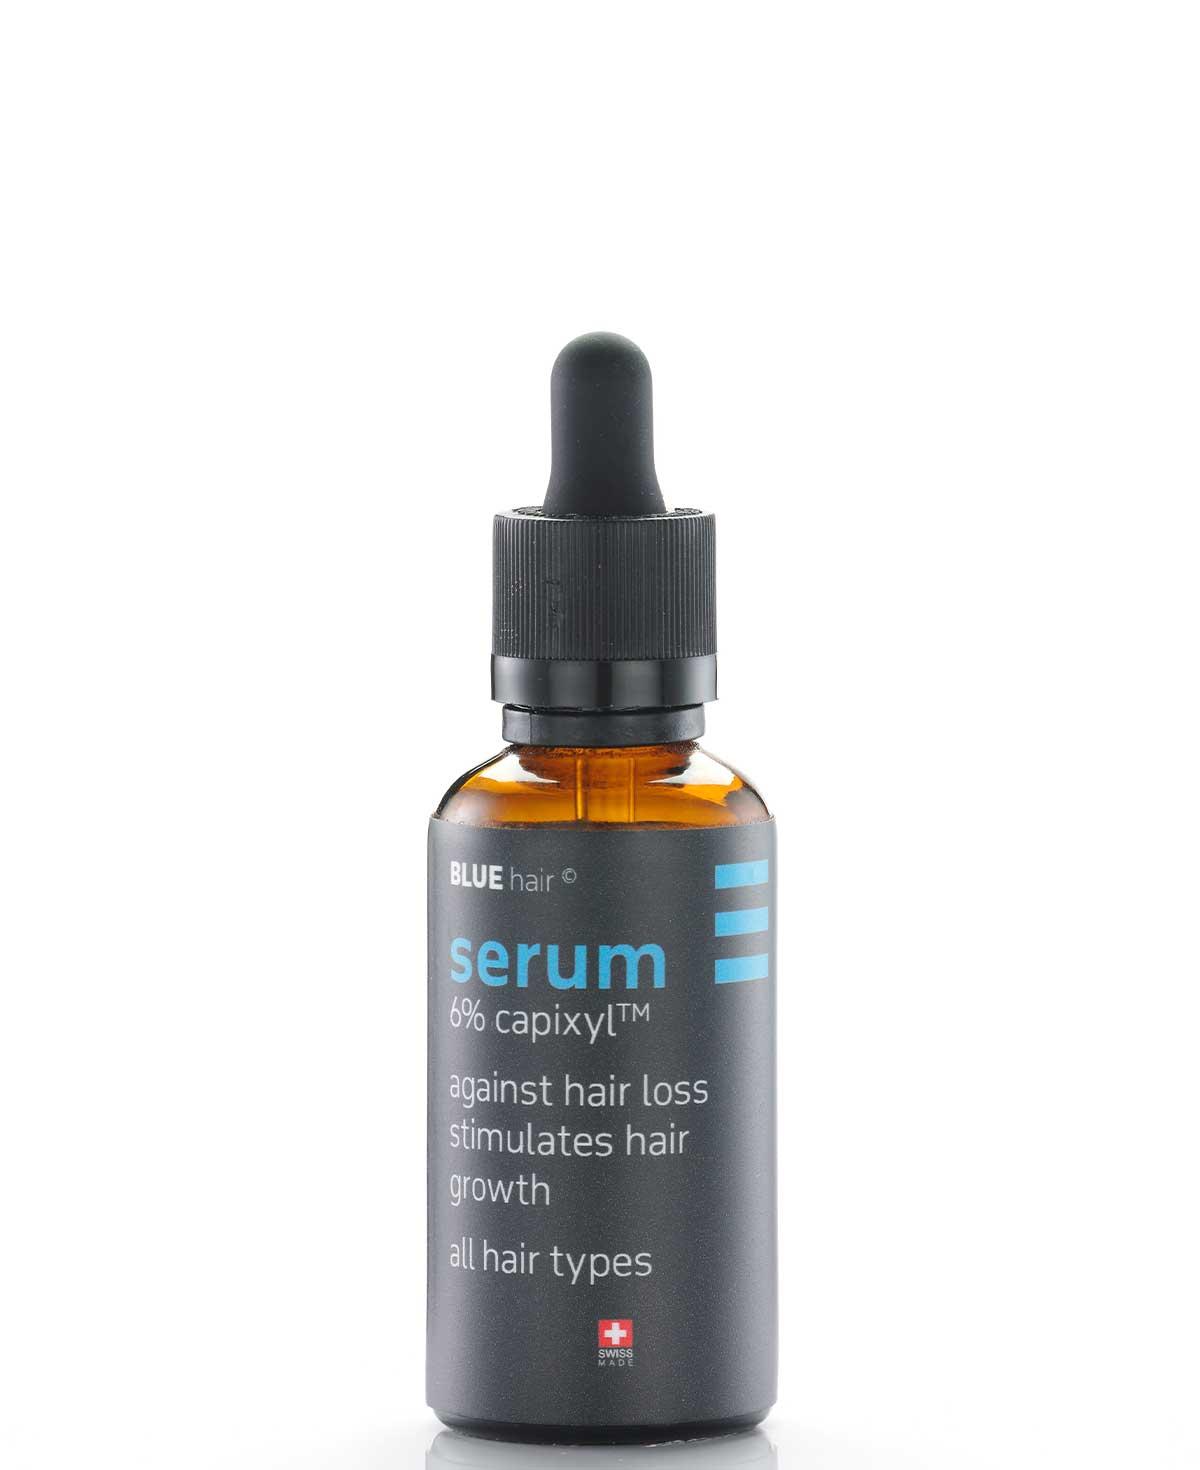 BLUE hair serum 6% capixyl 50ml